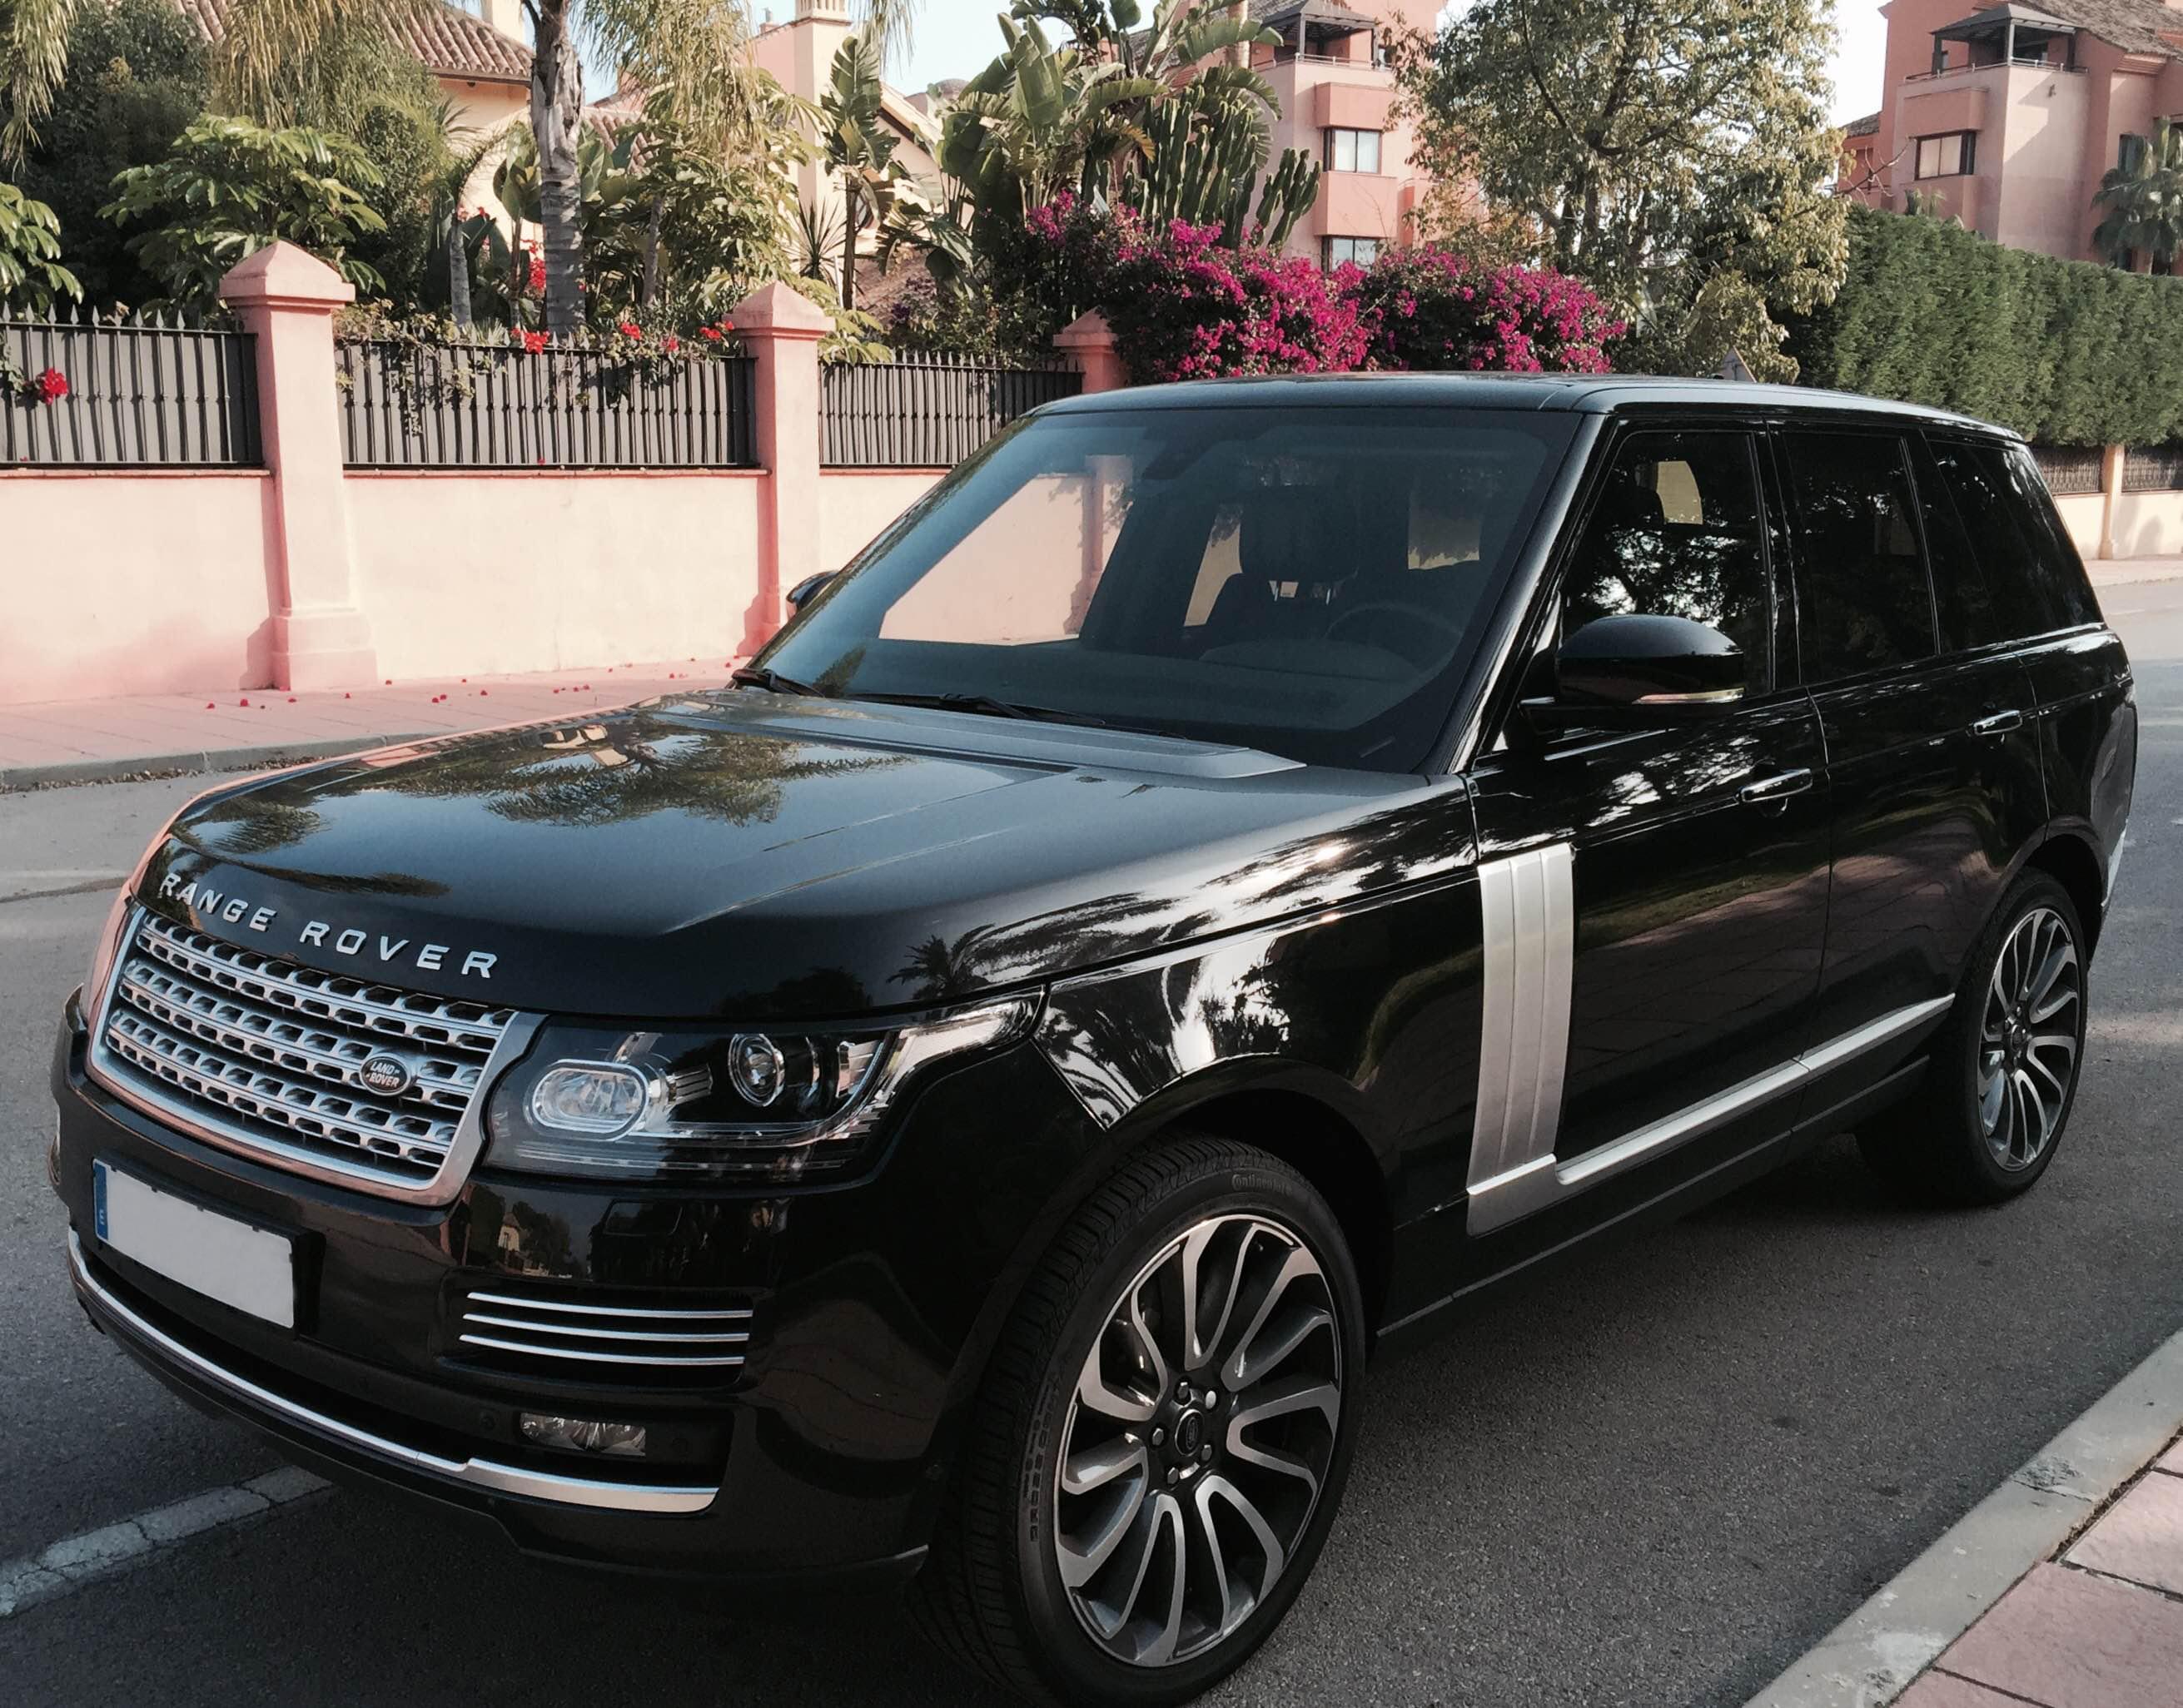 Range Rover Vogue Black - London